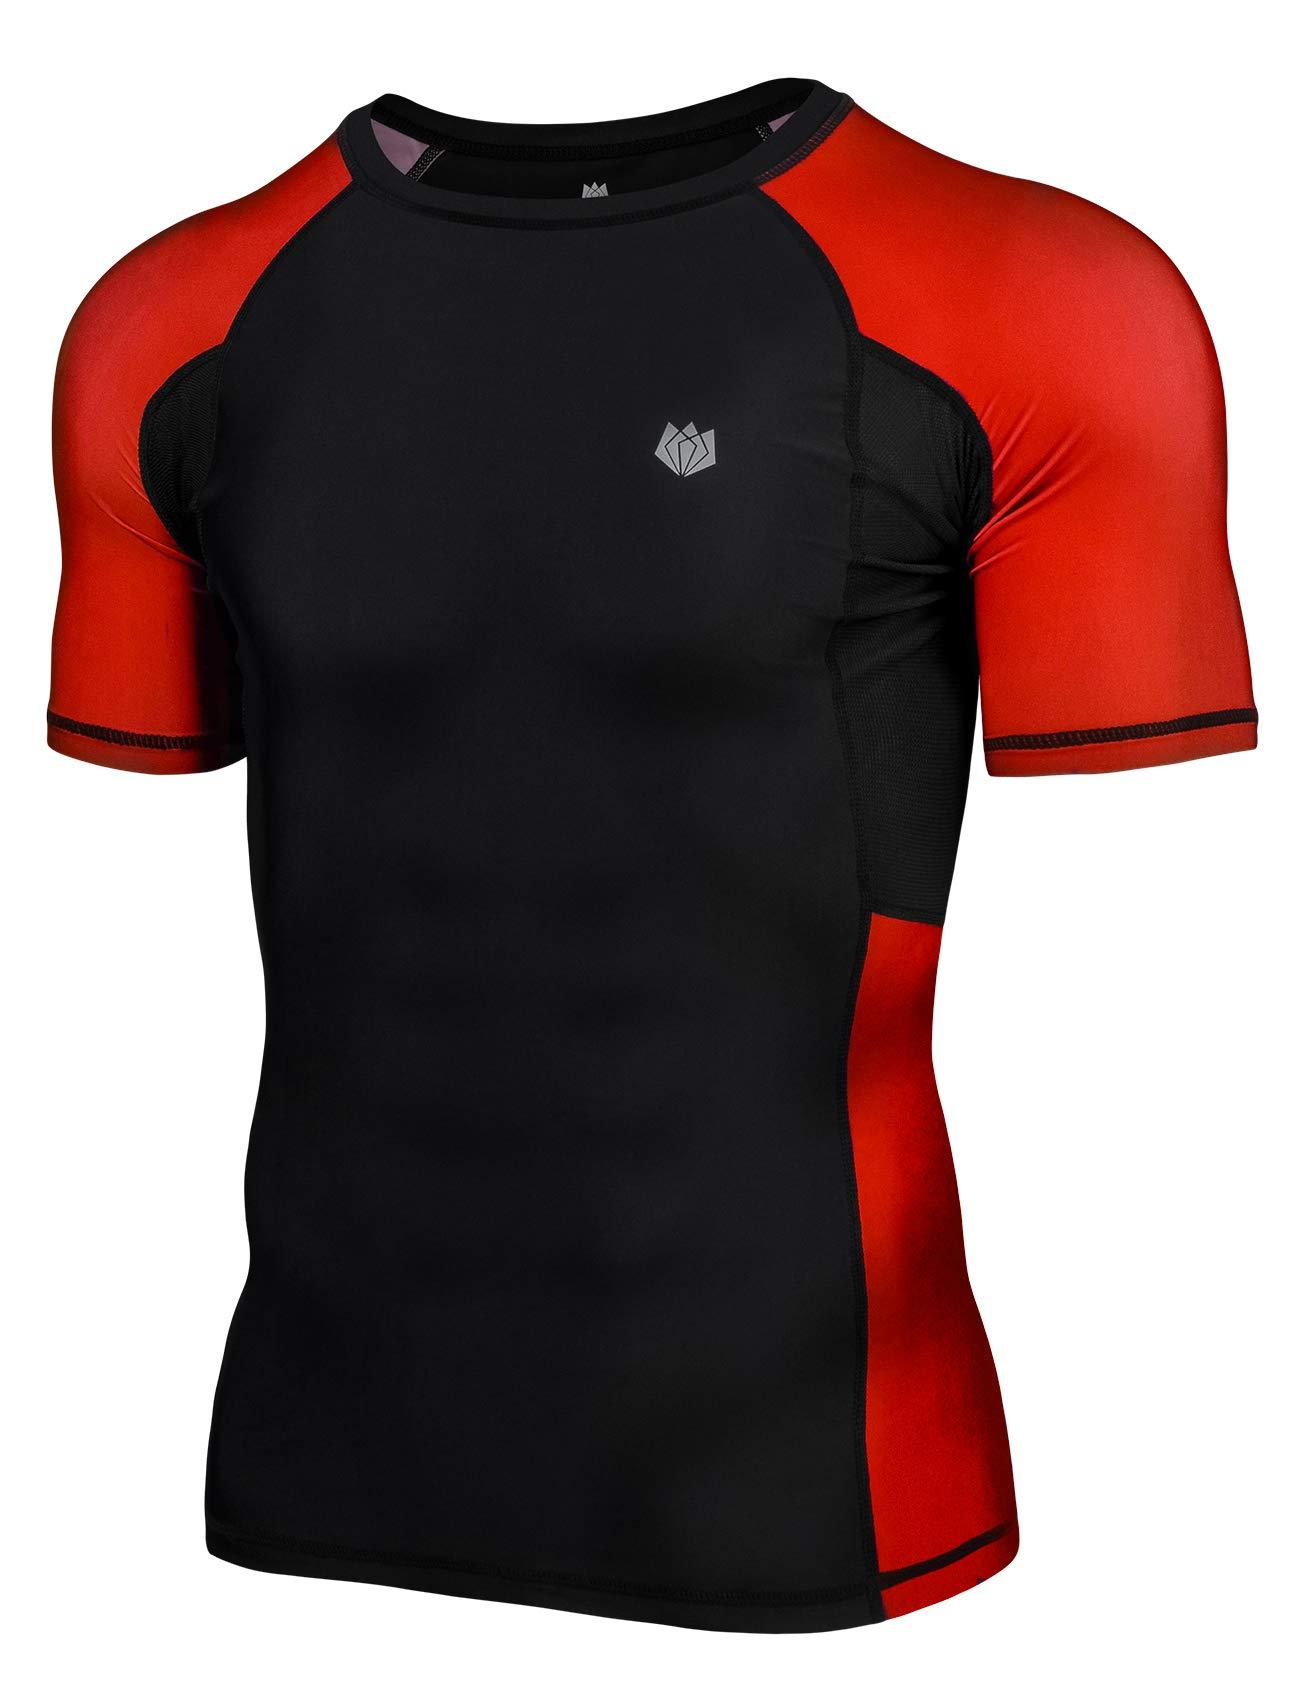 FitsT4 Men's UPF 50+ Sun Protection Short Sleeve Compression Training Swim Rash Guard Shirt for Gi,No-Gi,MMA,BJJ,Wrestling Red by FitsT4 Sports